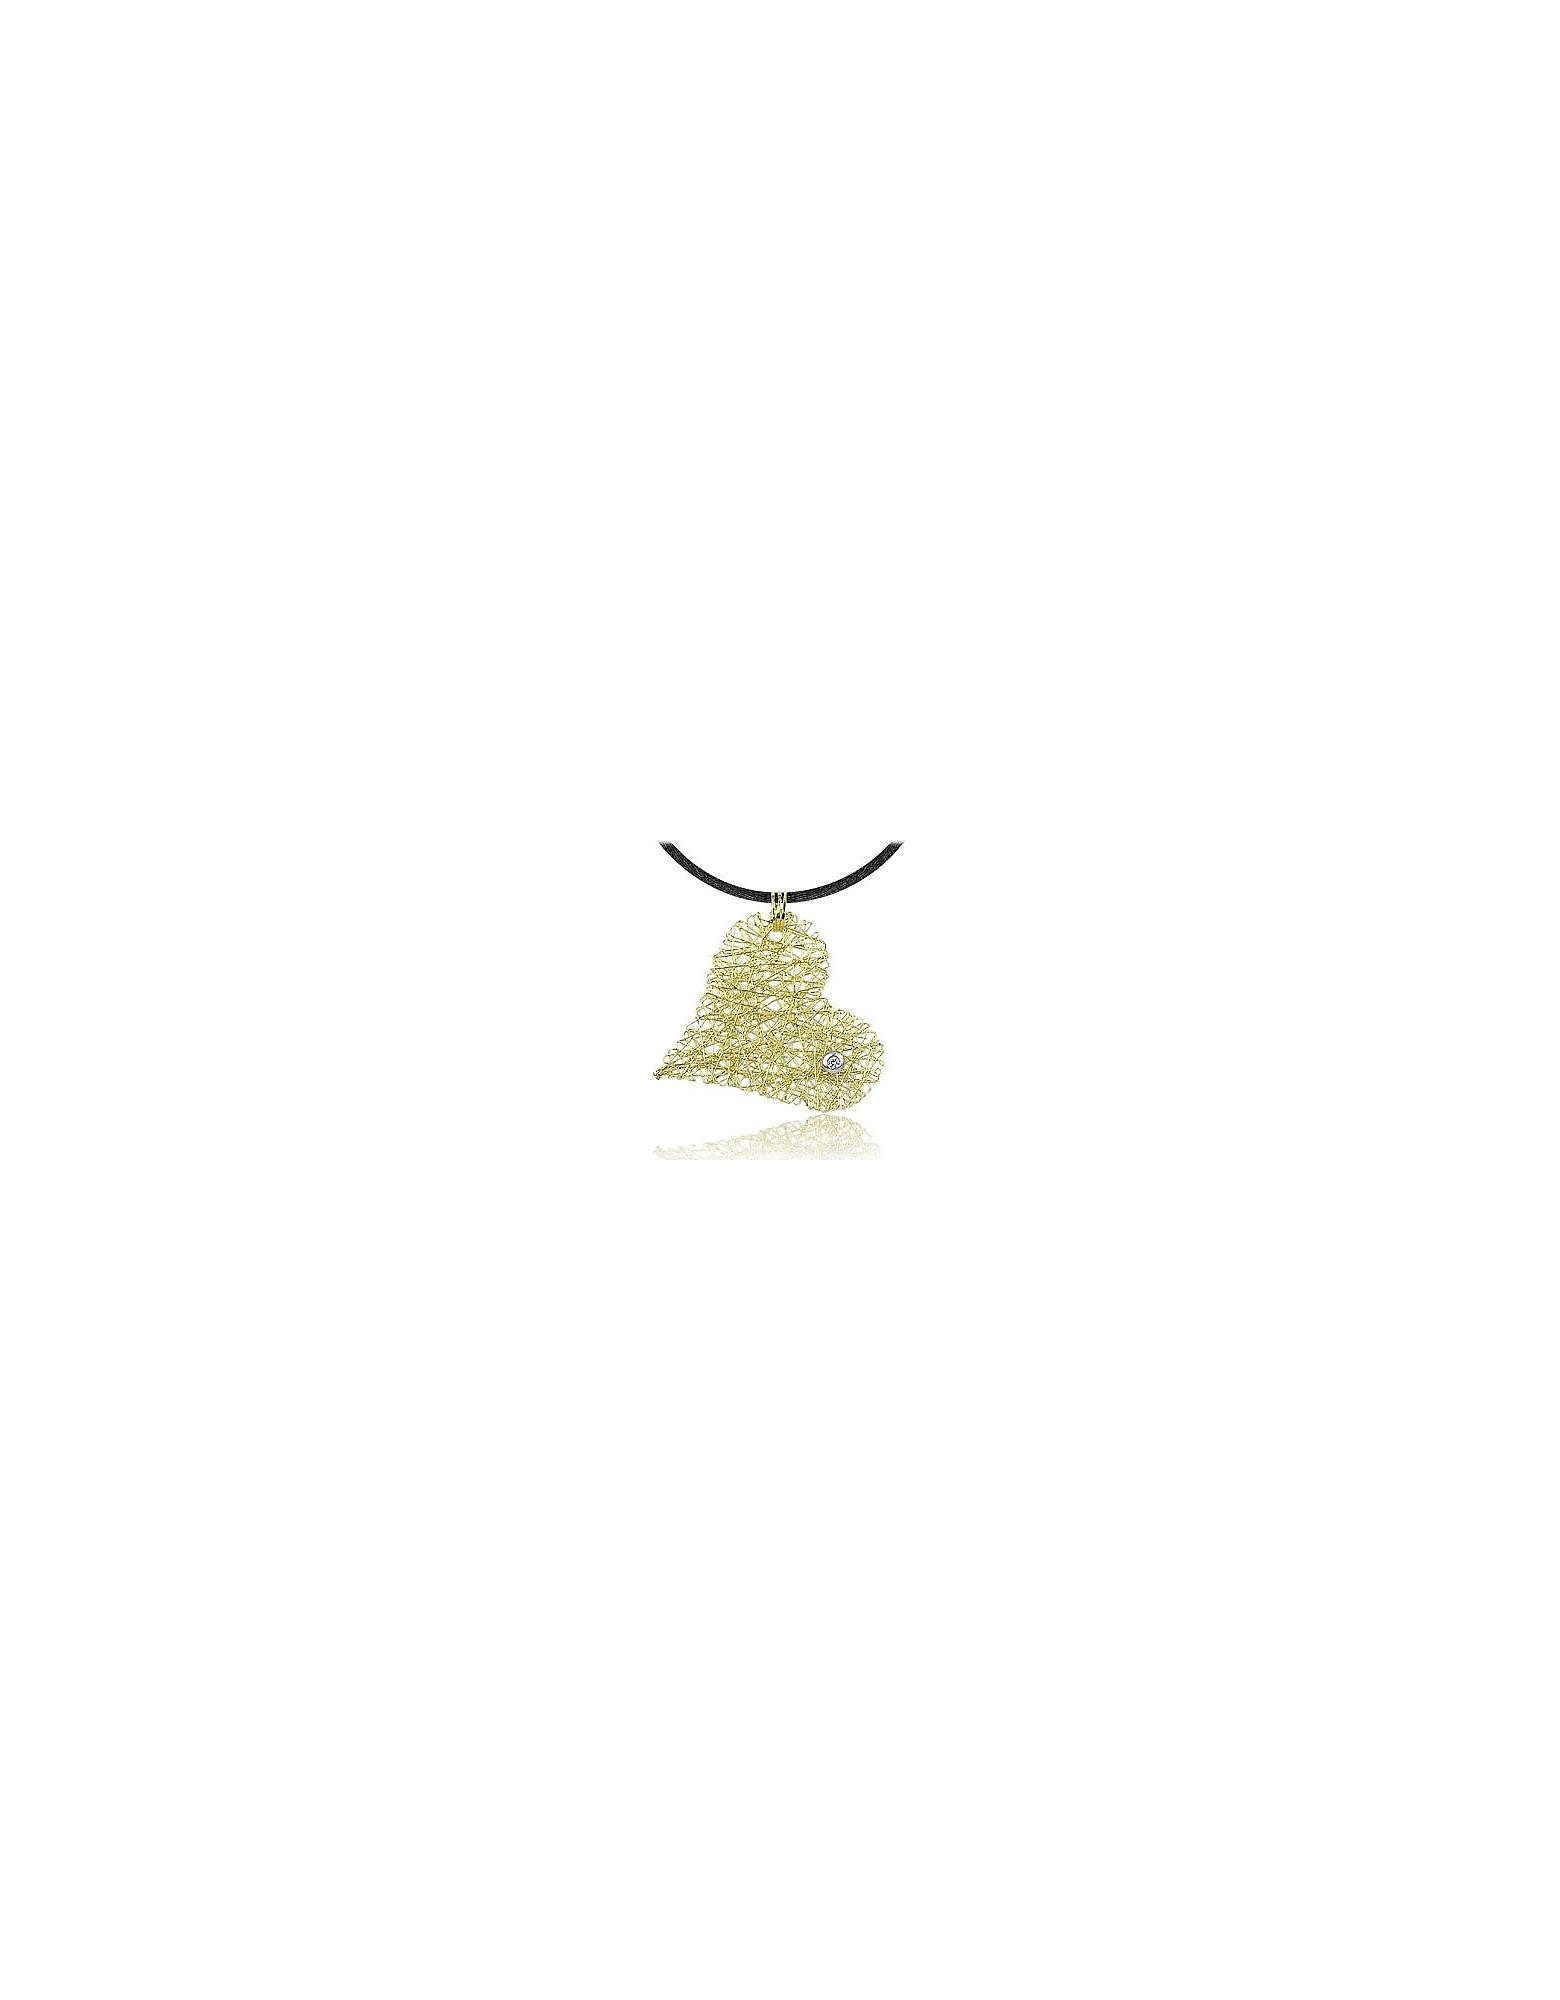 Orlando Orlandini Necklaces, Diamond 18K Yellow Gold Heart Pendant w/Lace